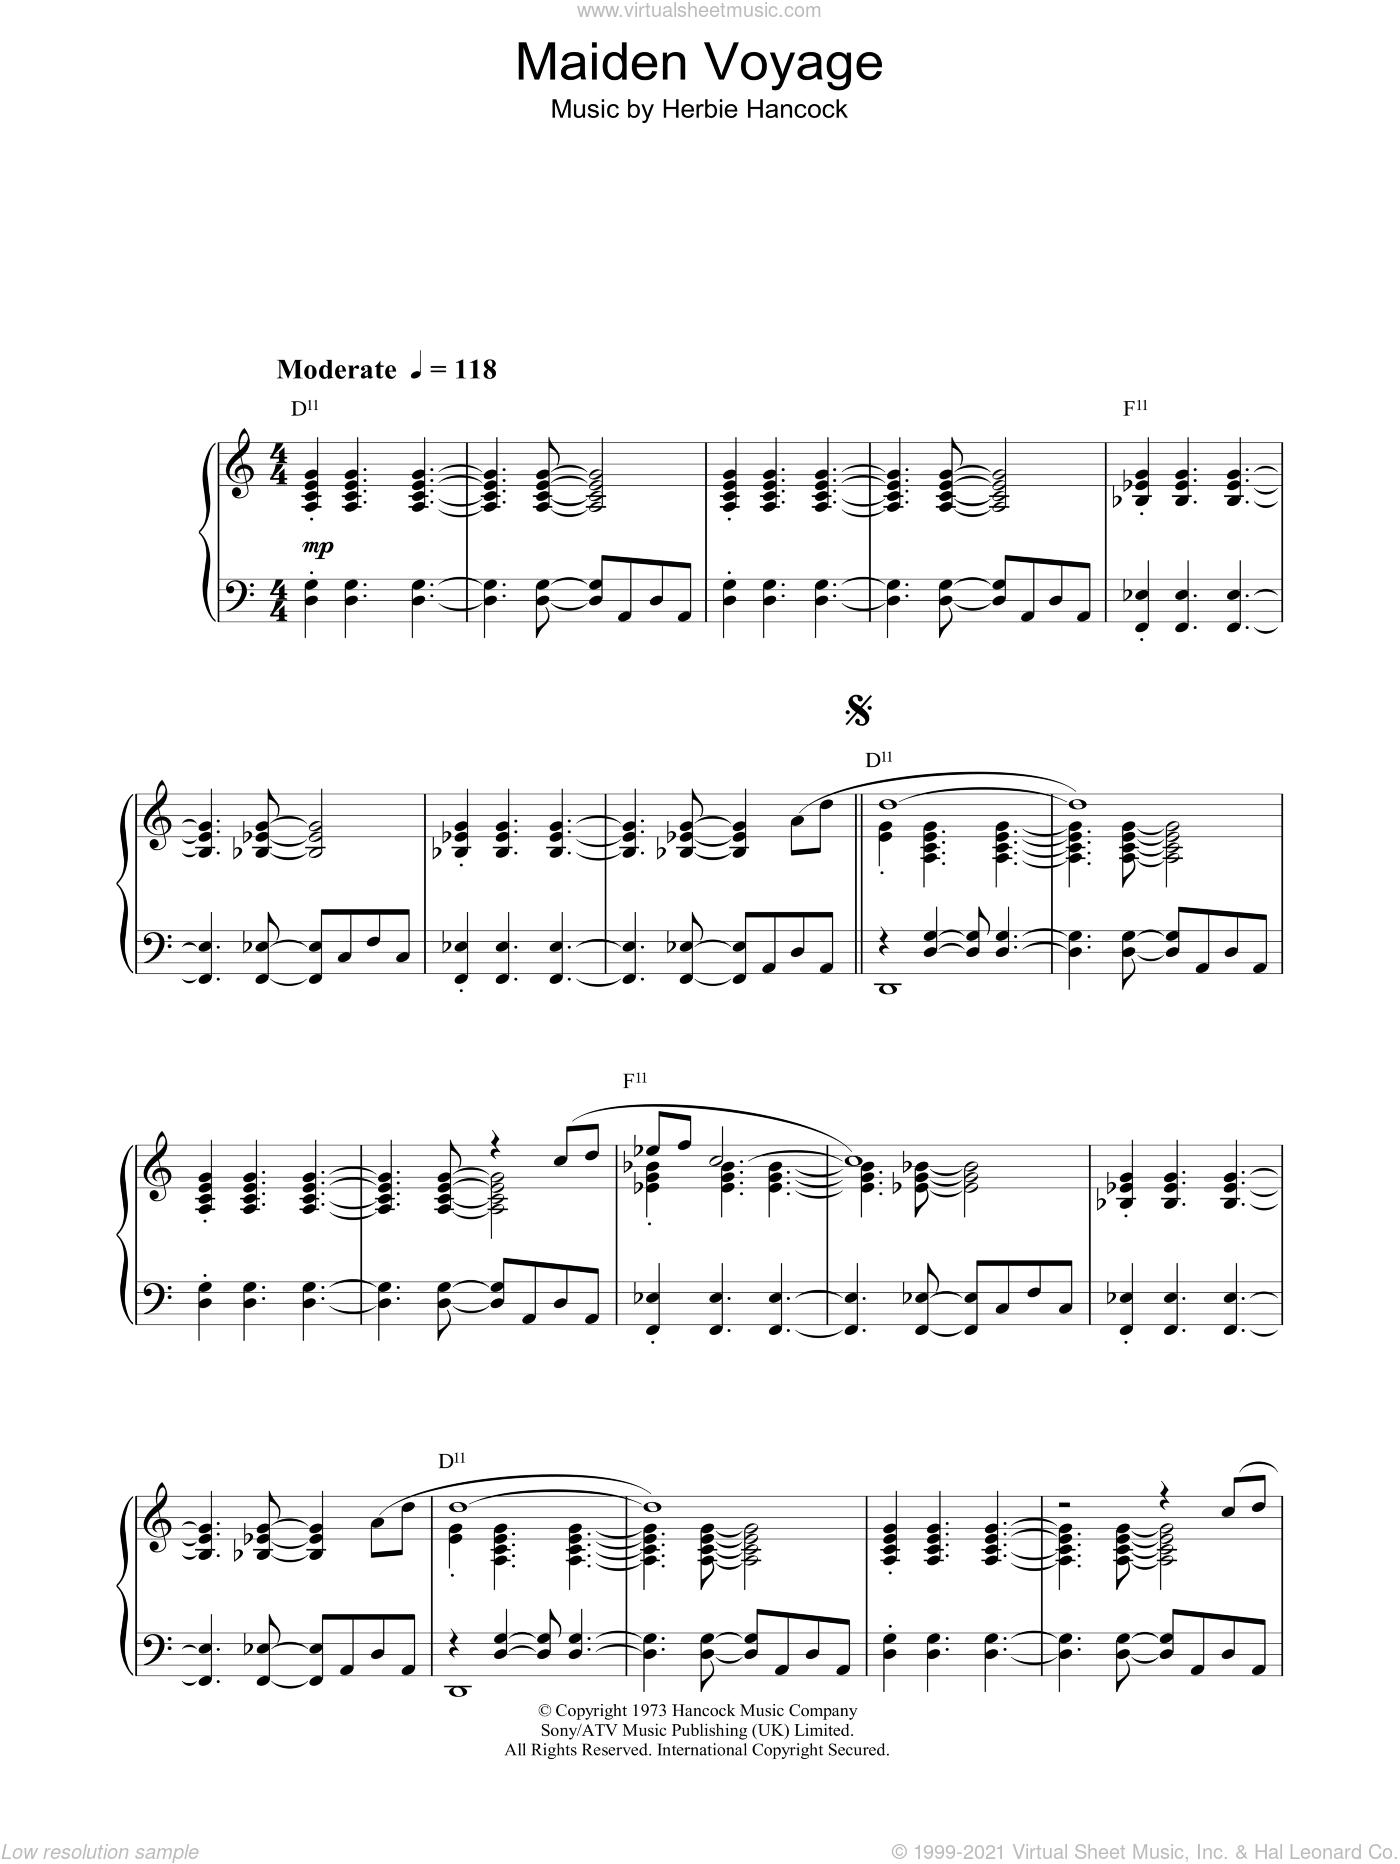 hancock - maiden voyage sheet music for piano solo [pdf]  virtual sheet music